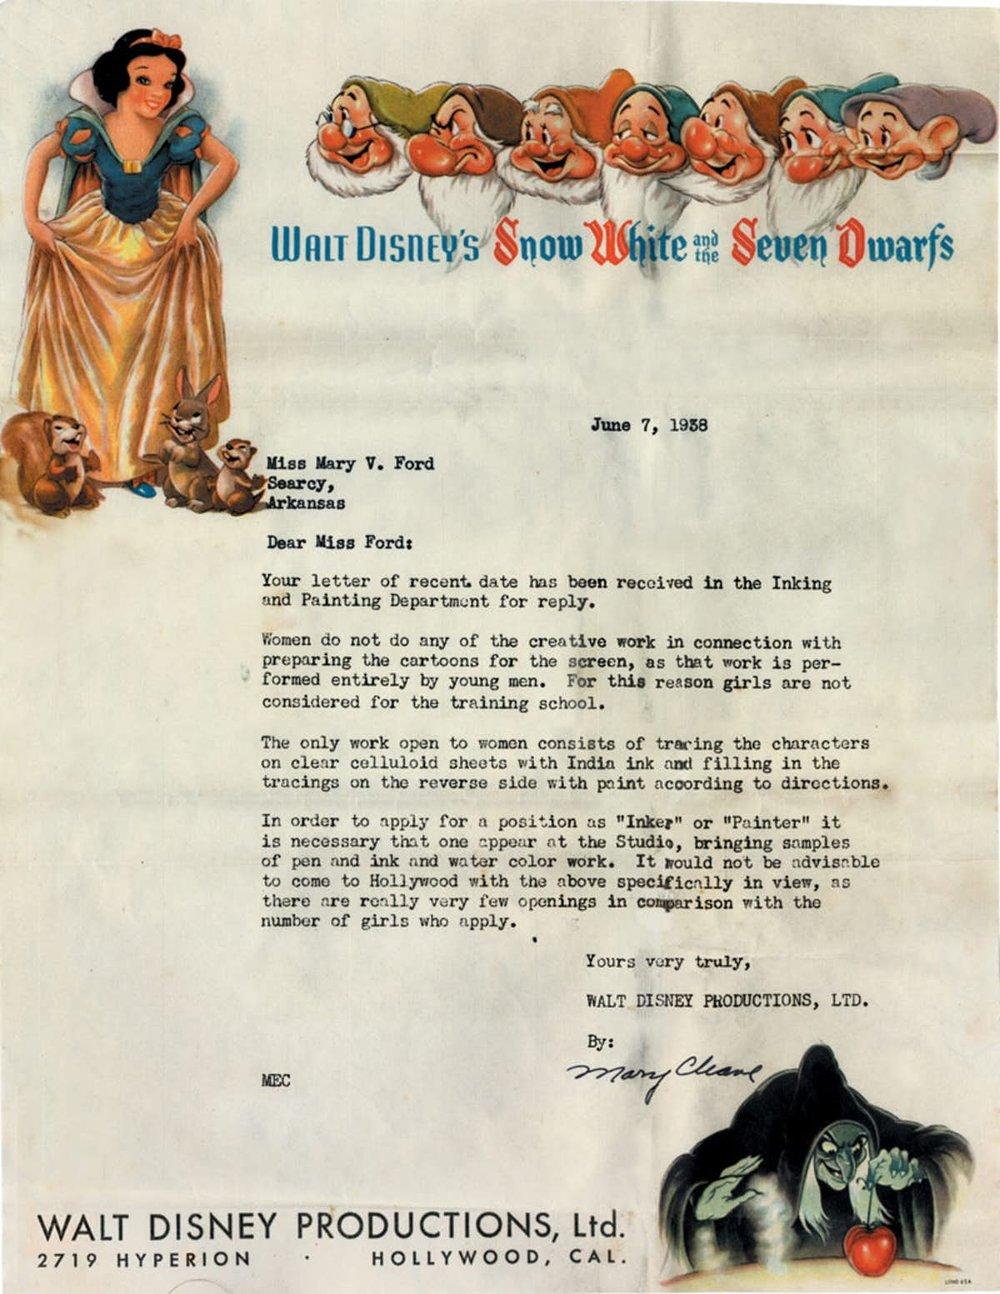 disneyrejectionletter1938.jpg